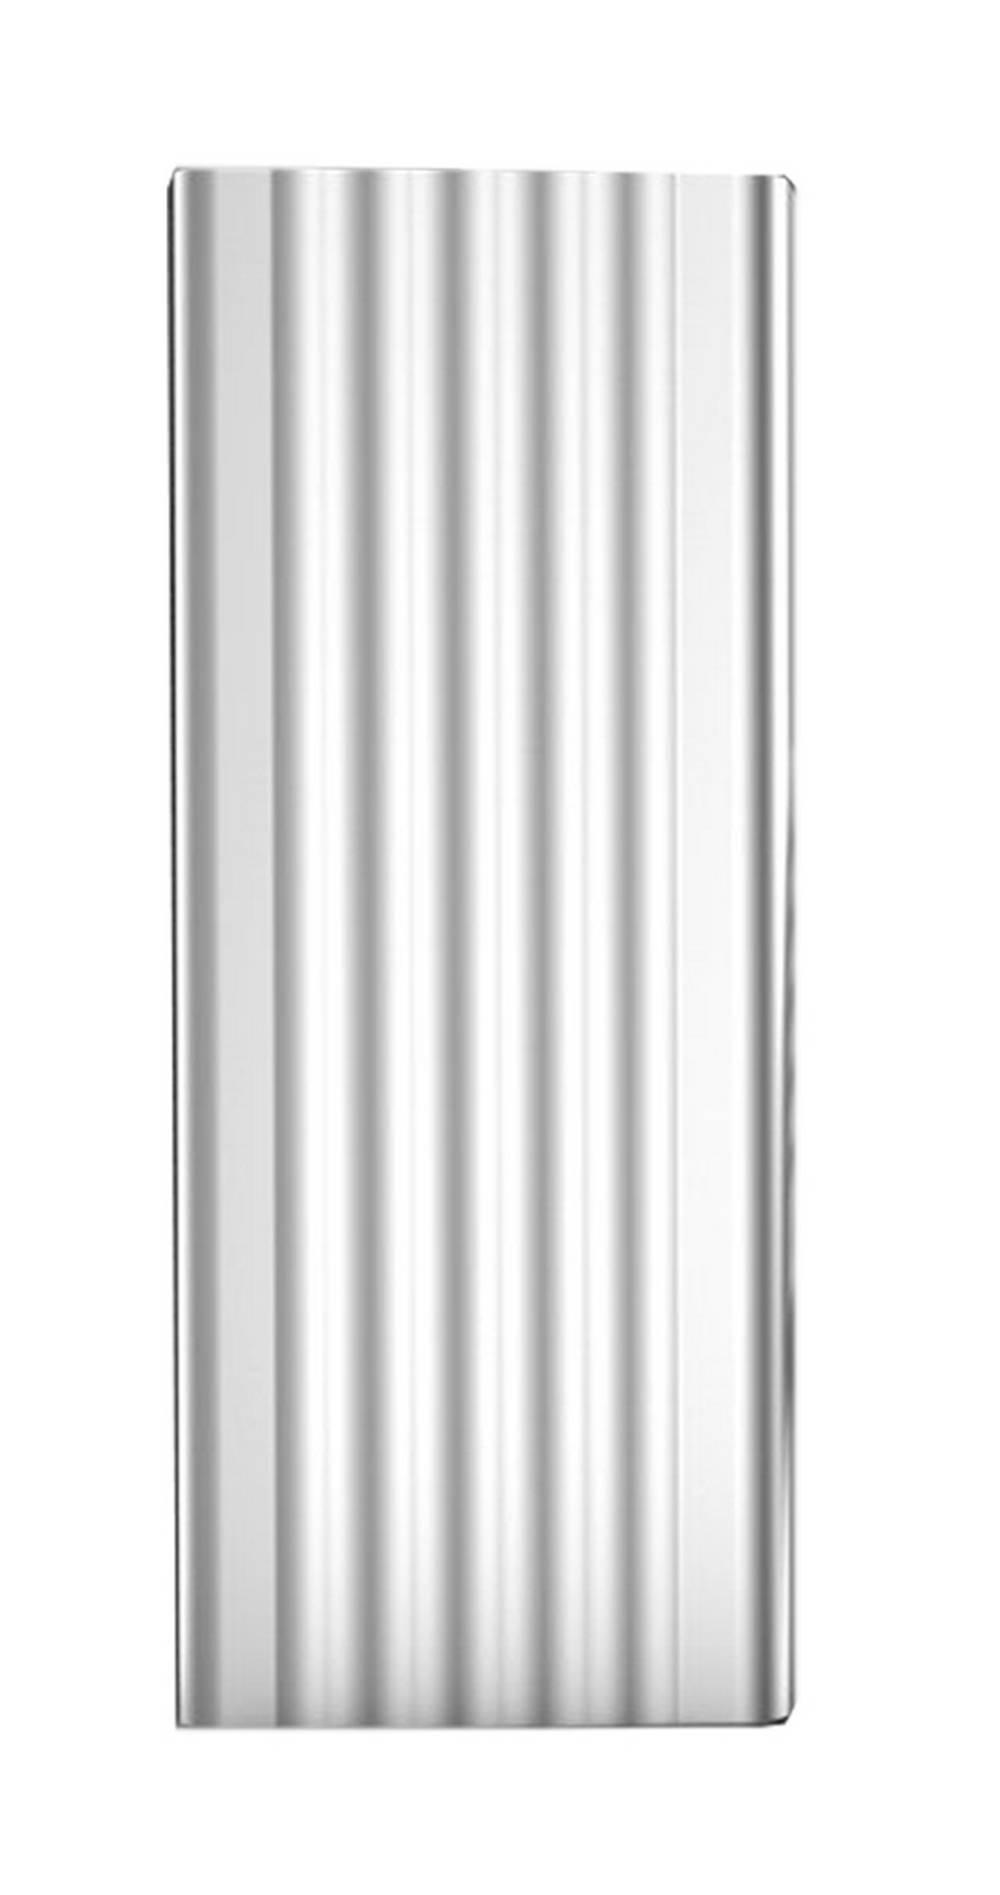 Power Bank Remax Vanguard RP-V20 20000 mAh Dual Usb Ασημί